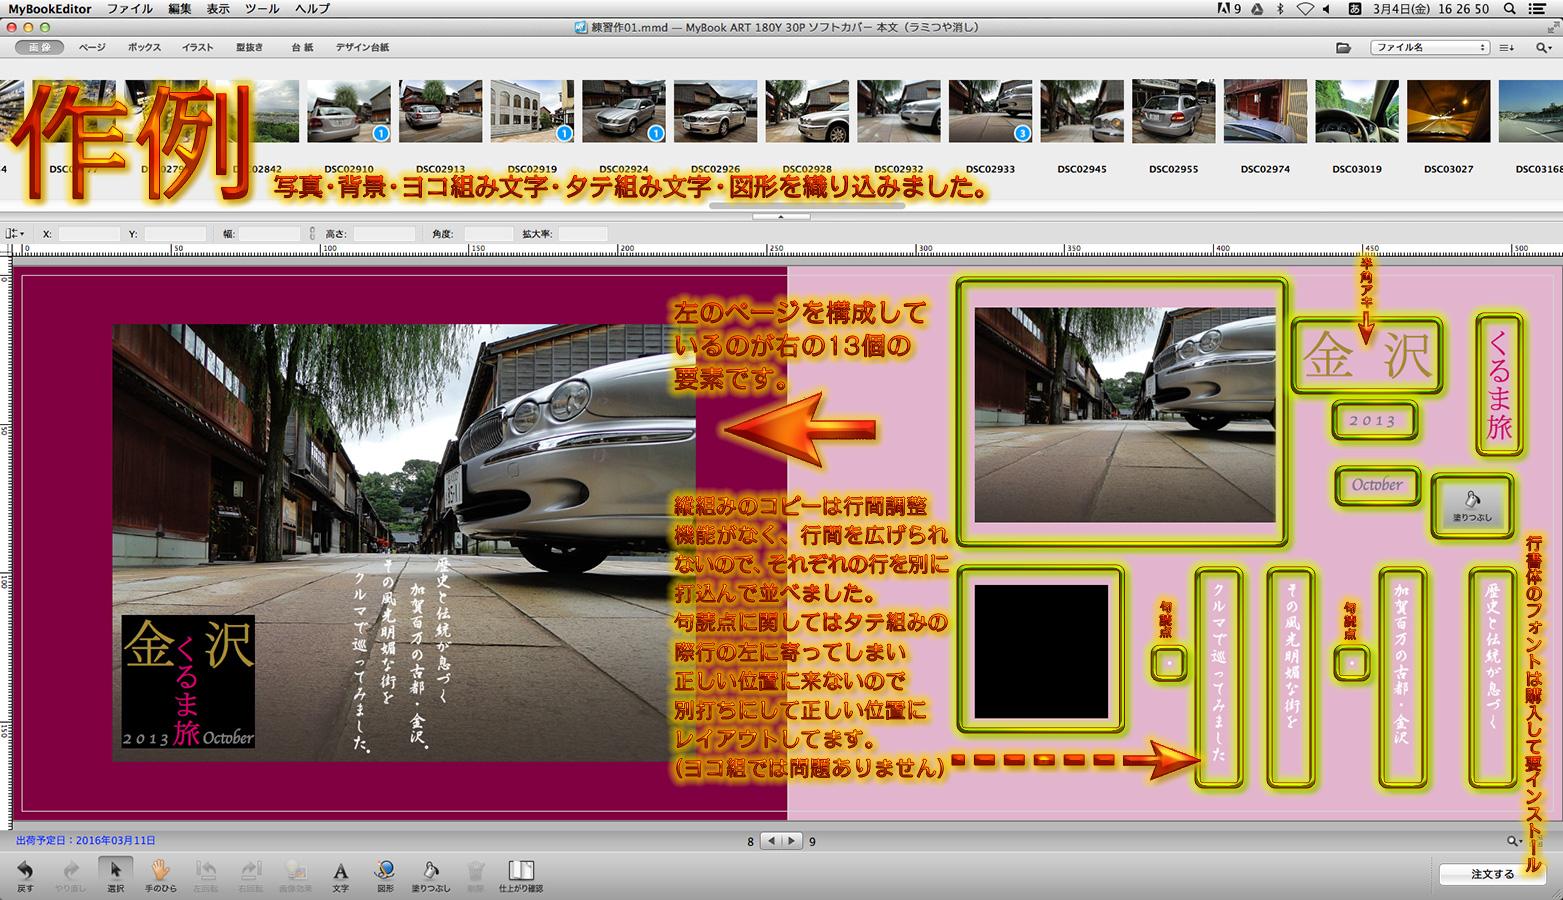 http://moritetsu.info/car/img/mb065-2016-03-04-16-26-50.jpg